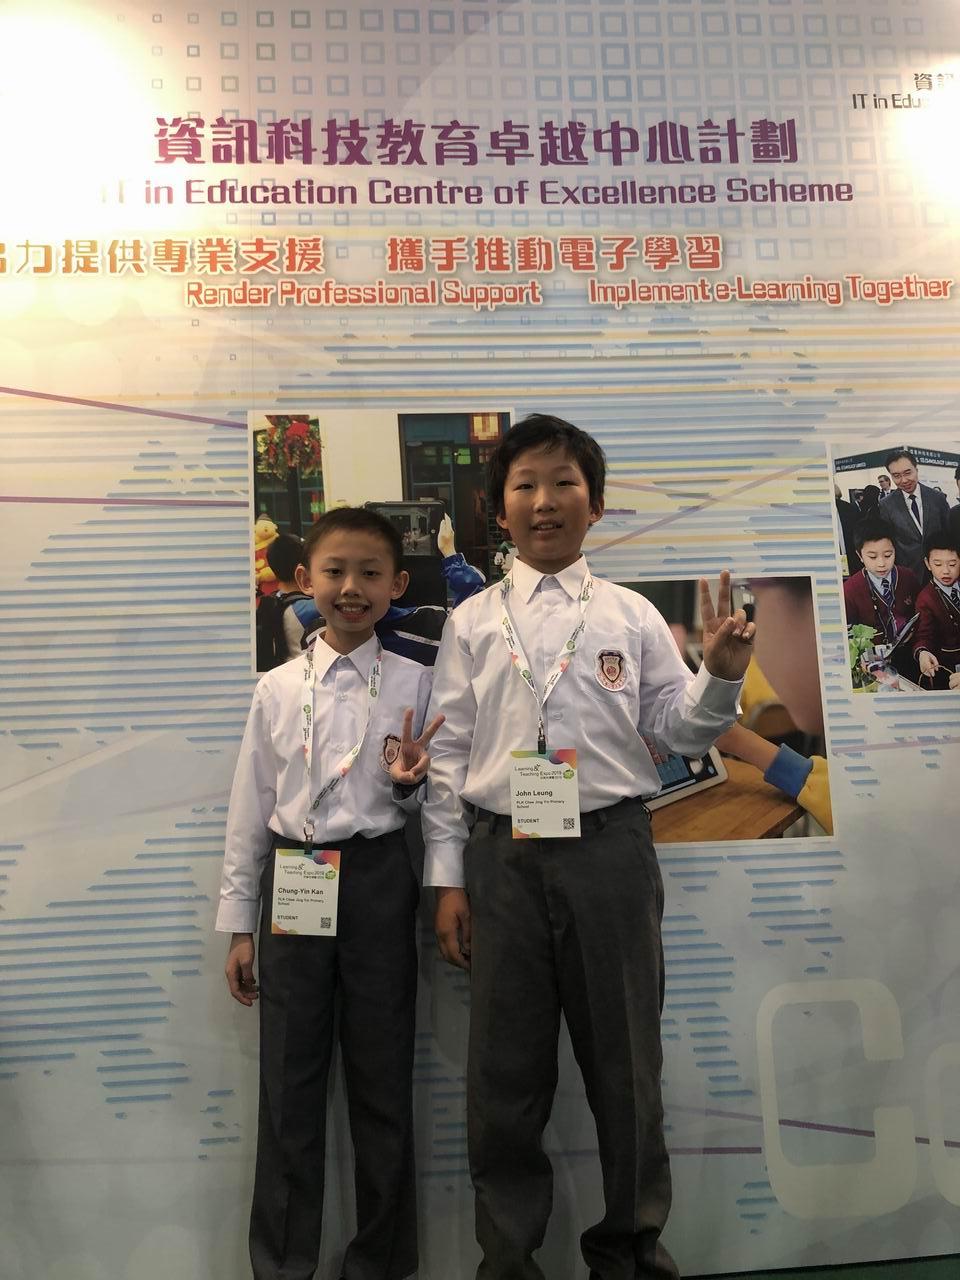 https://plkcjy.edu.hk/sites/default/files/xuan_zhuan_img_6030.jpg